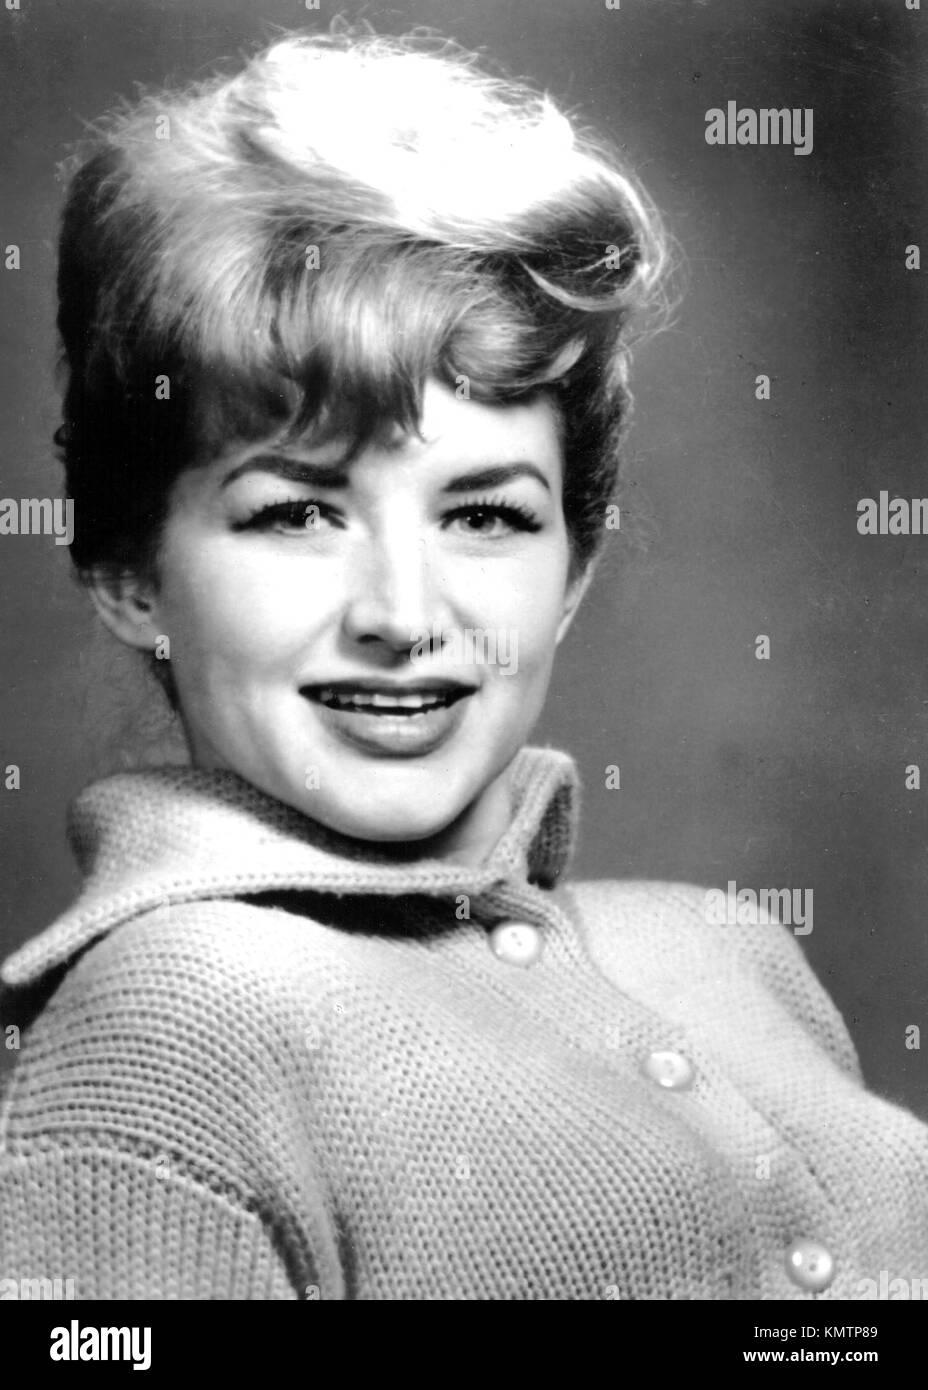 DEBBIE DEAN (1928-2001) American singer about 1962 - Stock Image